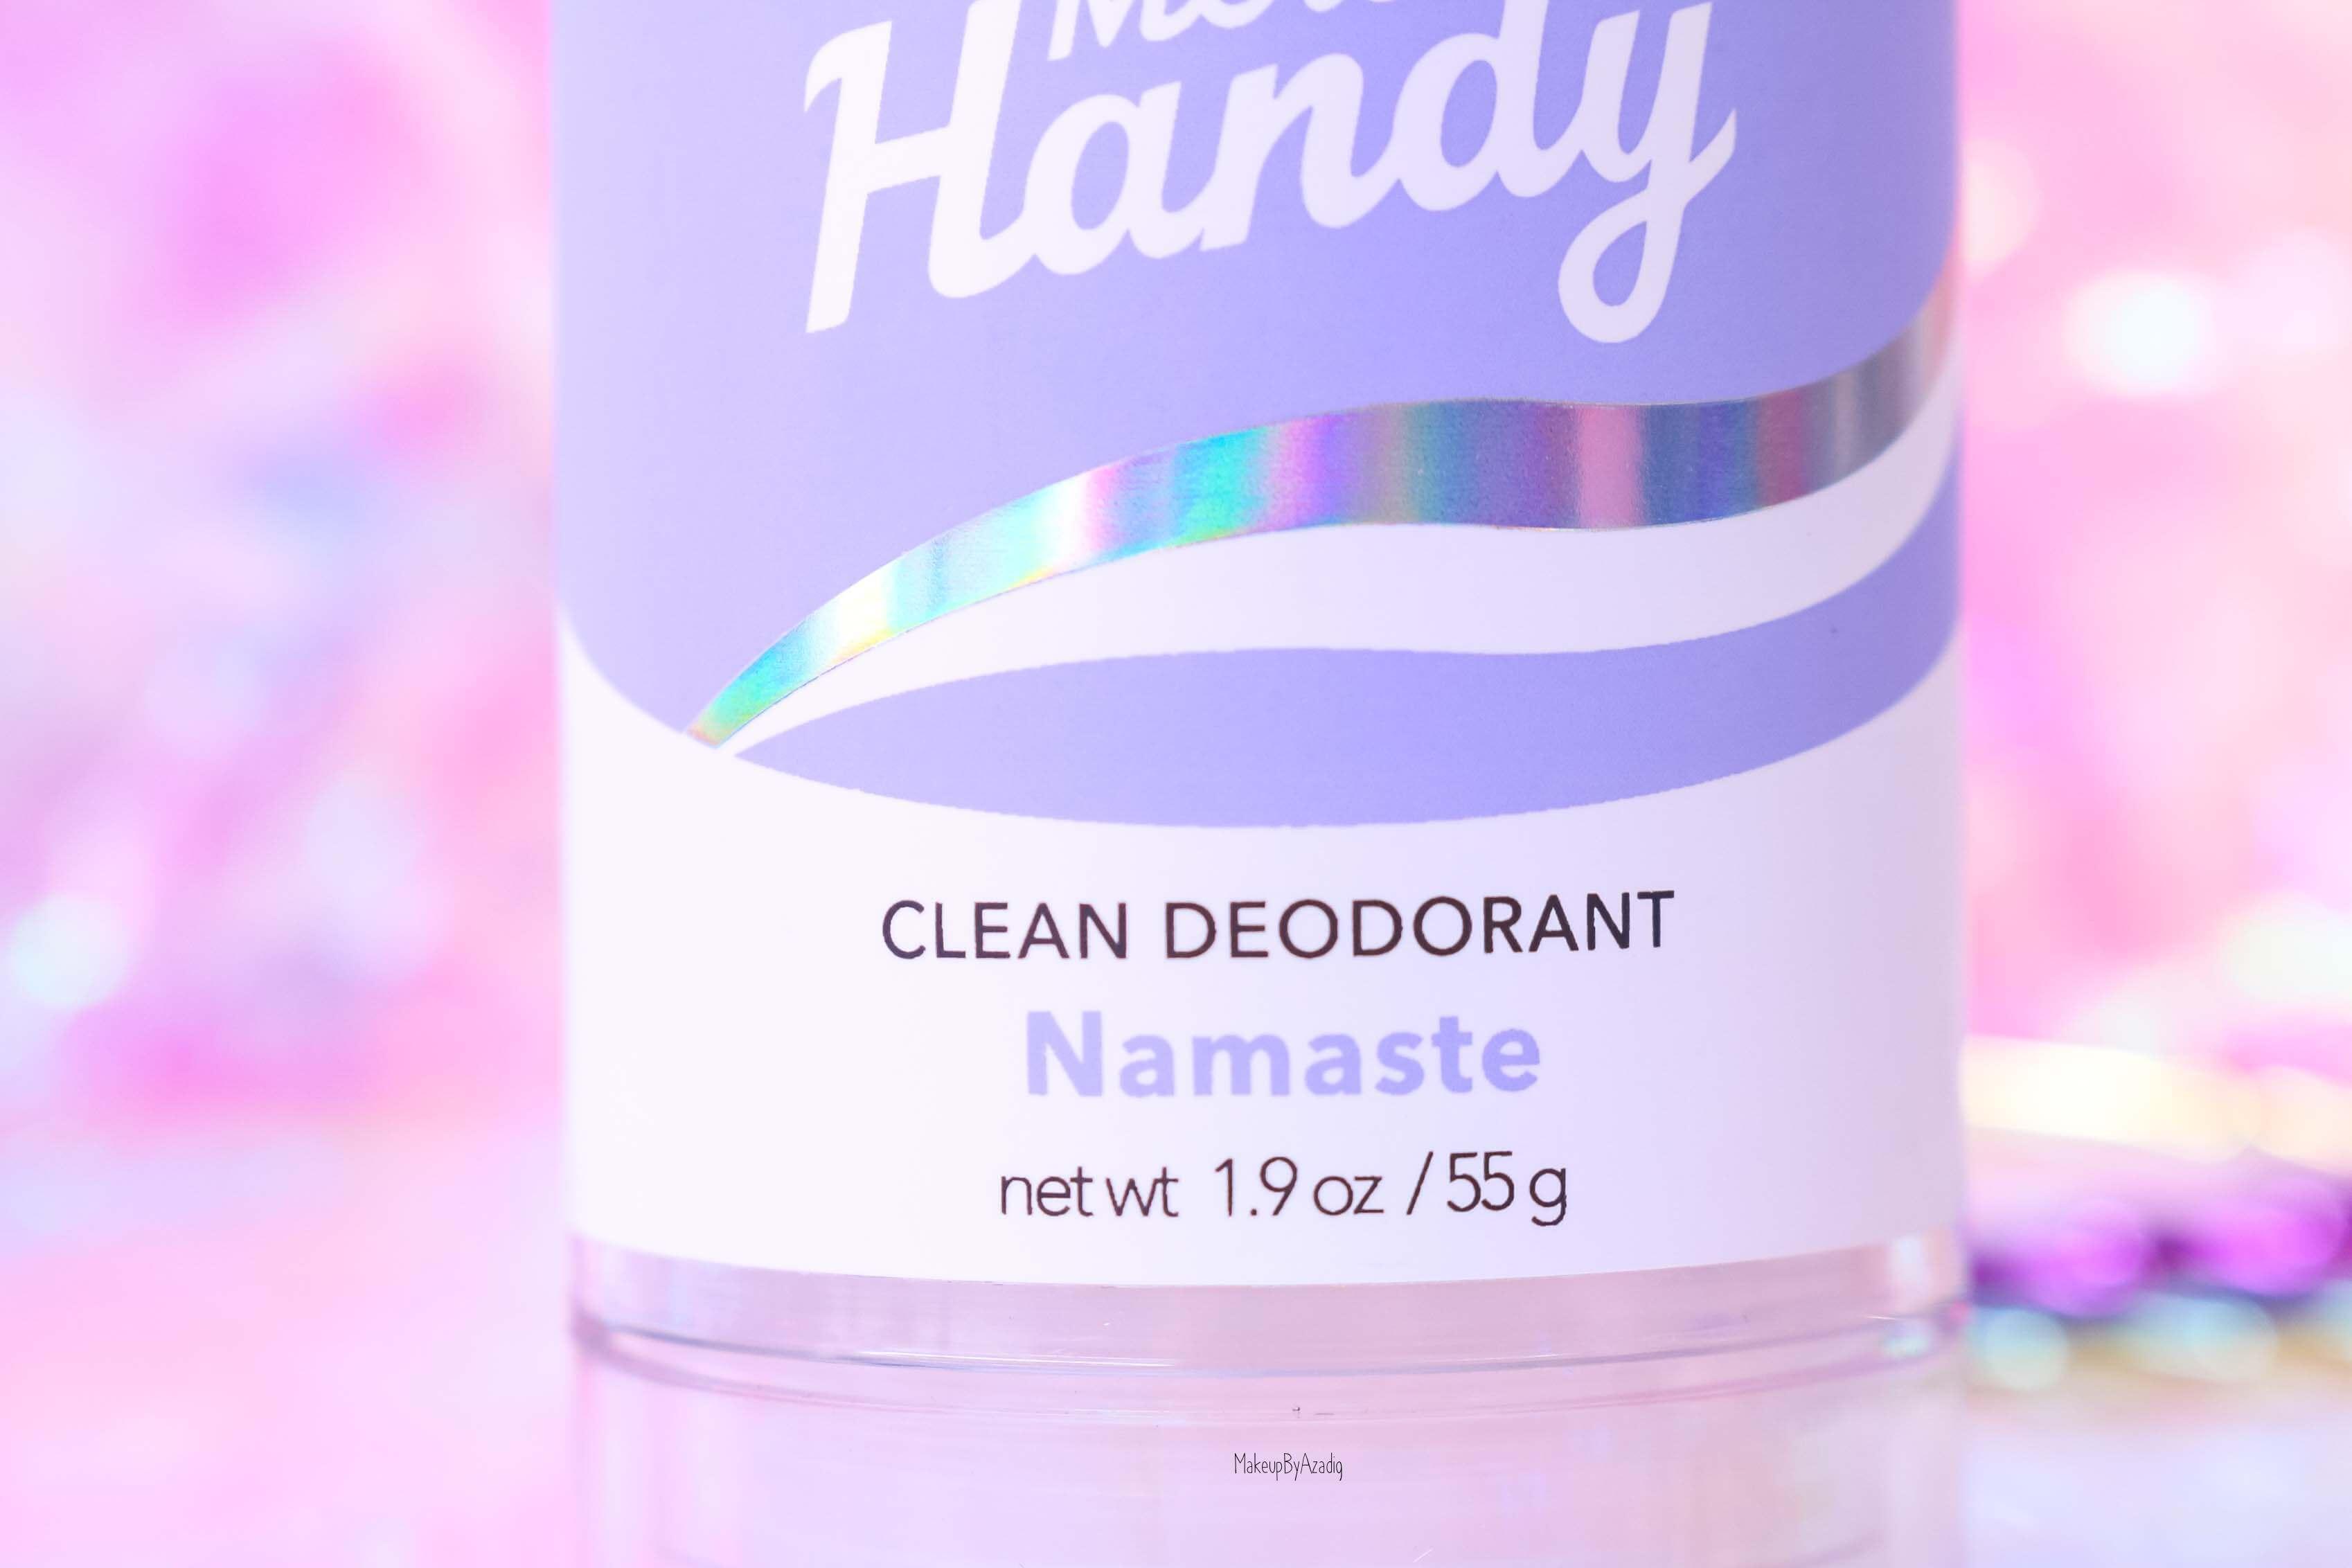 revue-clean-deodorant-merci-handy-namaste-flower-power-sans-aluminium-cruelty-free-avis-prix-makeupbyazadig-sephora-efficacite-quantite